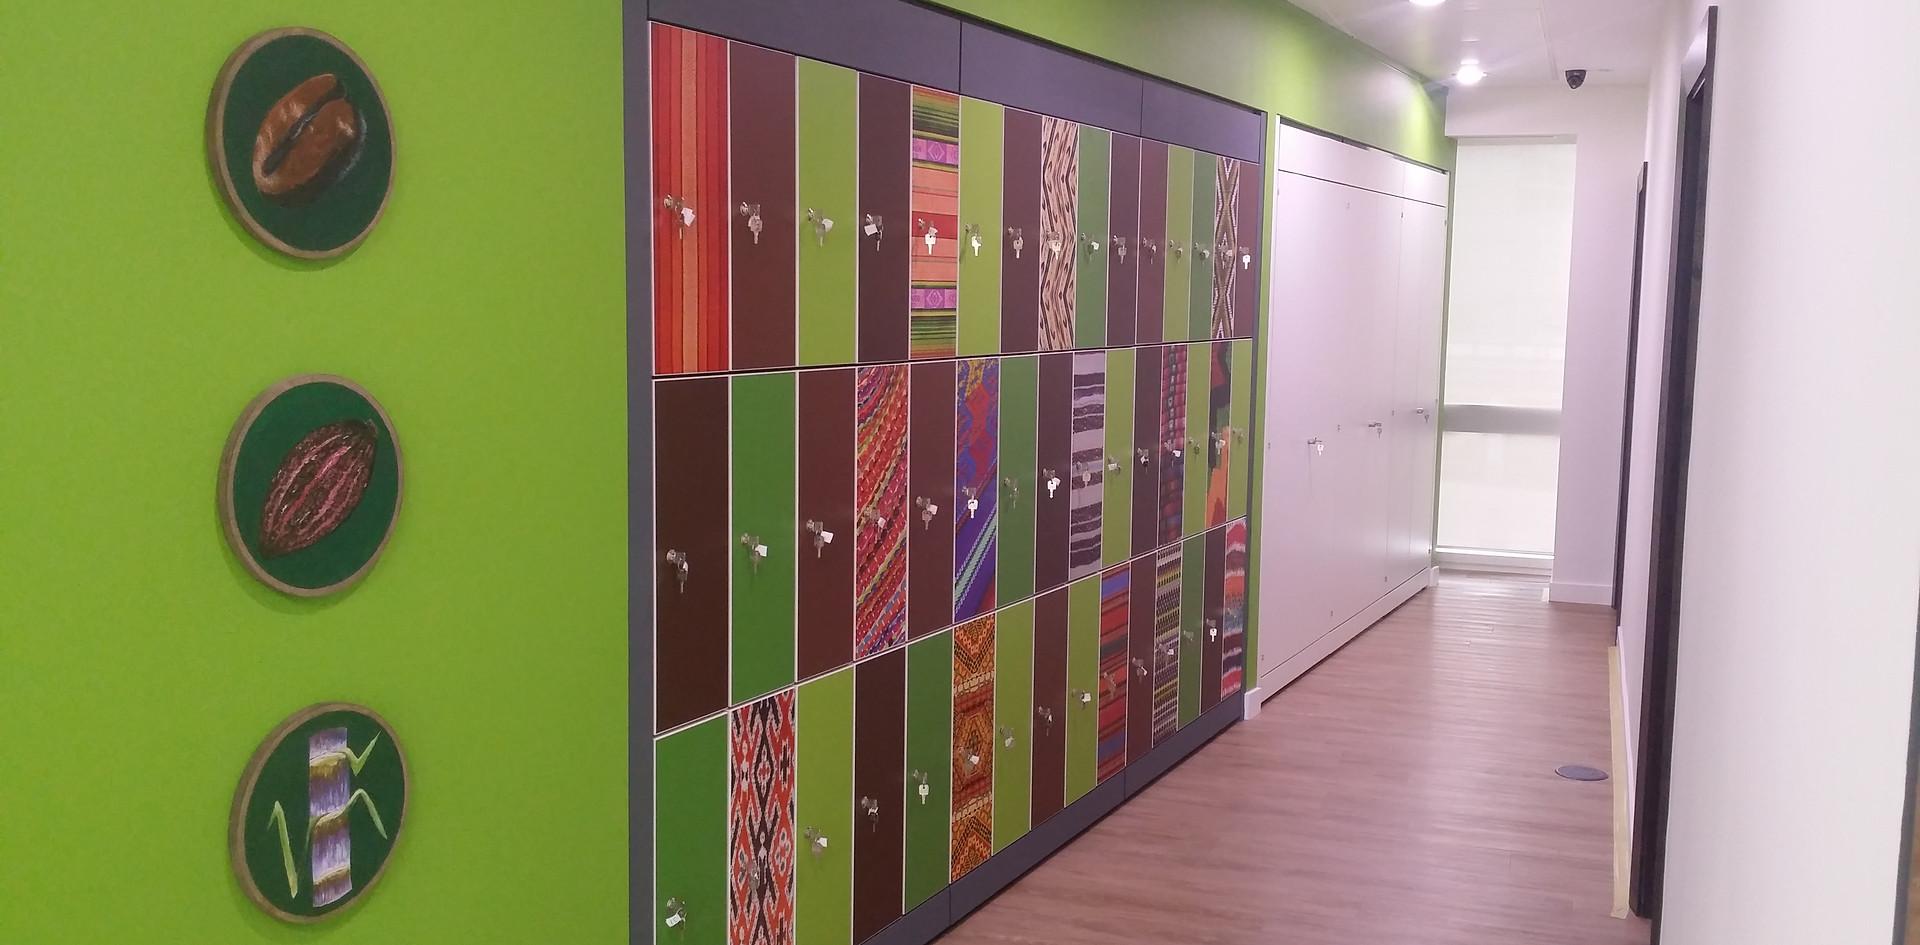 bespoke agile workplace smart flexible working lockers graphic overlay key locking